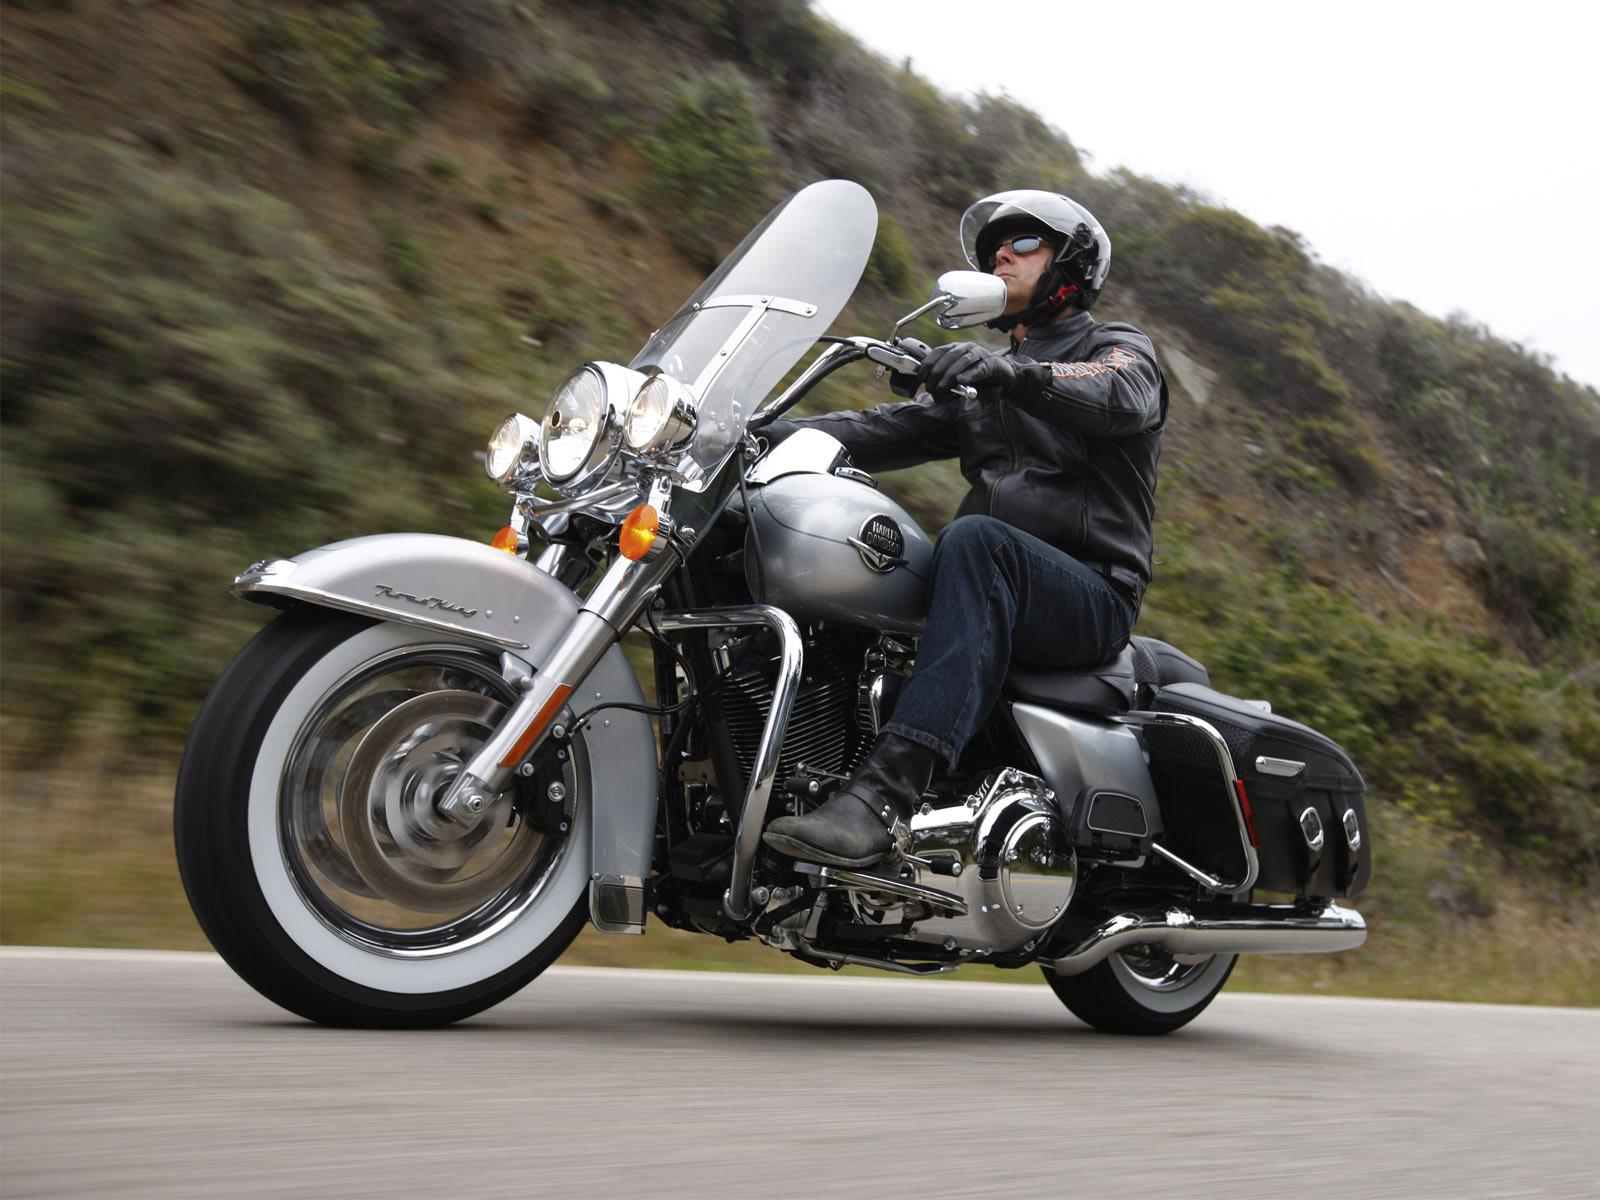 http://2.bp.blogspot.com/_7OBlGXSTB6s/TBRPBEofM4I/AAAAAAAAByU/kV-sRflUstI/s1600/Harley-Davidson+_FLHRC_Road_King_Classic_08.jpg